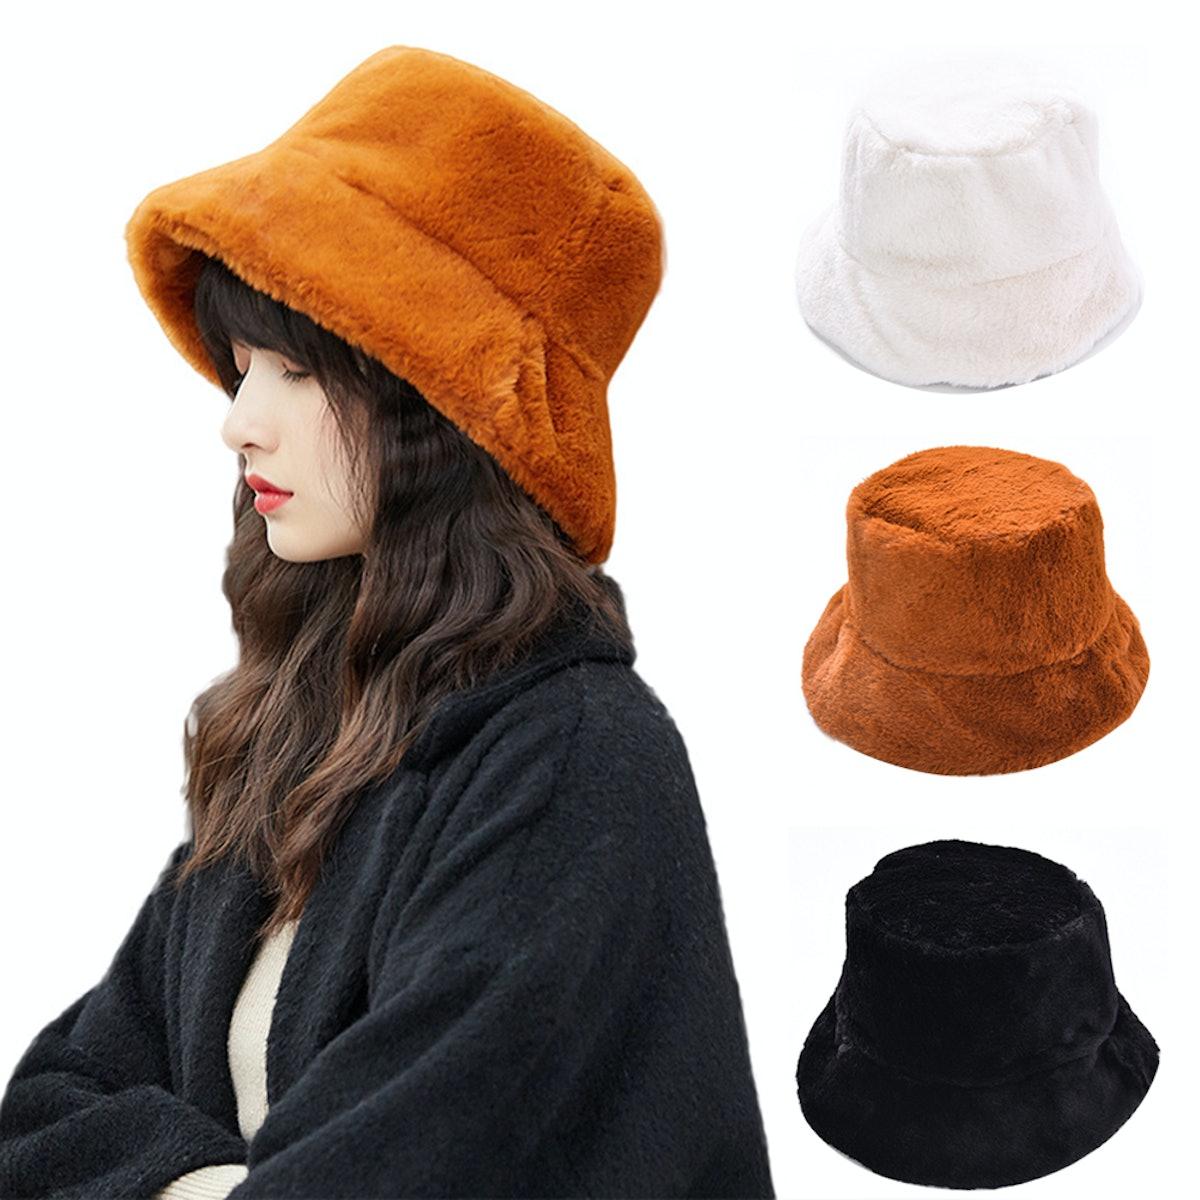 Spring Park Chic Women's Winter Solid Color Plushy Faux Fur Wide Brim Thick Warm Bucket Cap Fish Hat